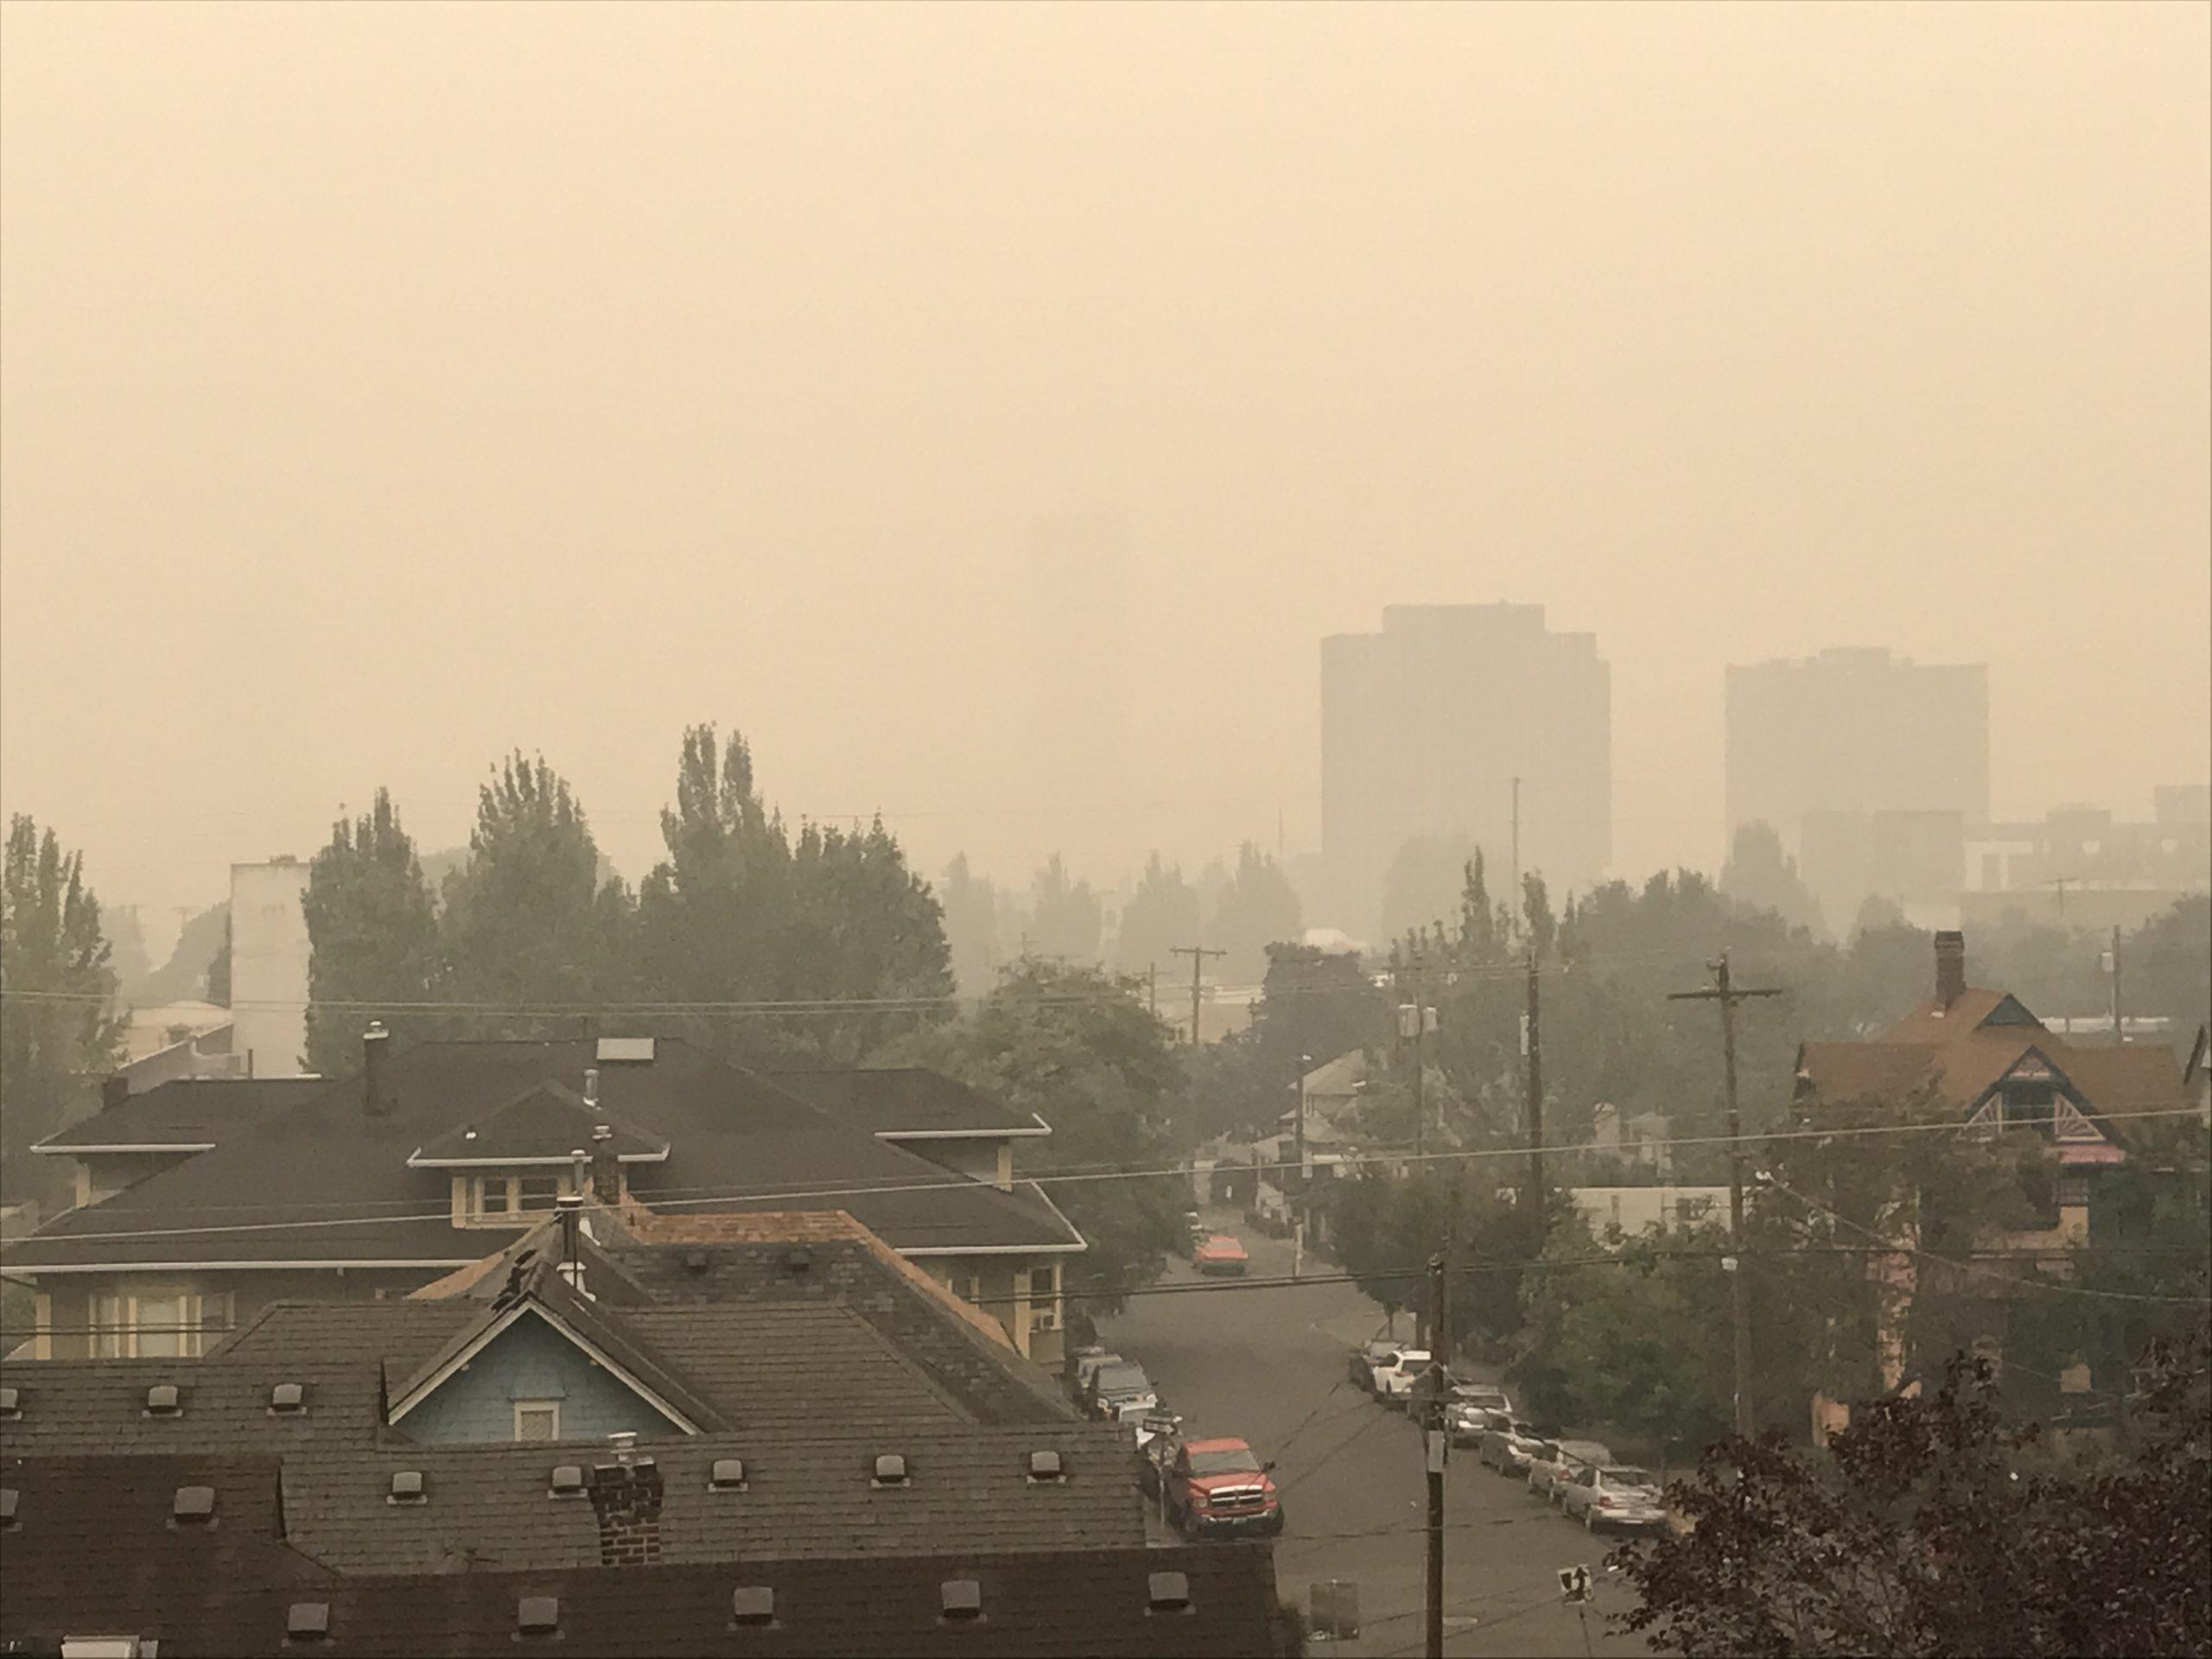 Smoke from fires in Portland, Oregon